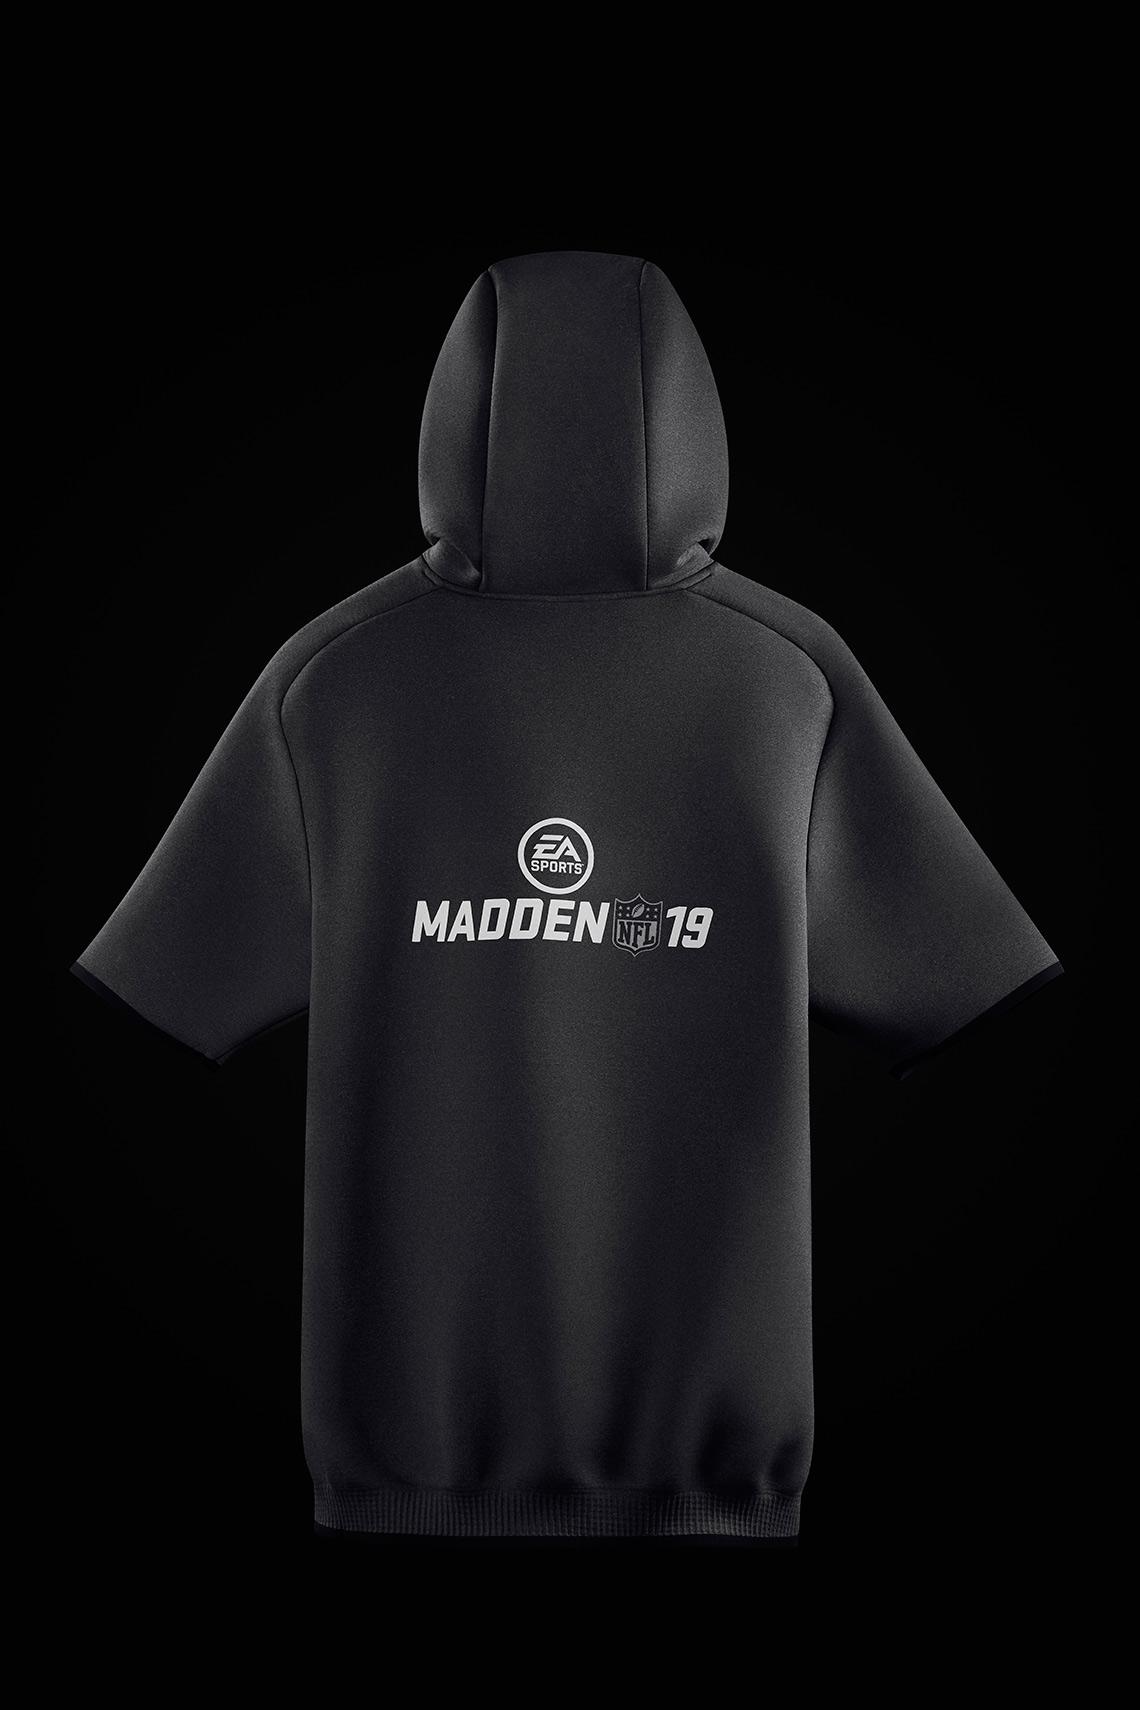 EA Sports Nike Vapormax Madden Pack